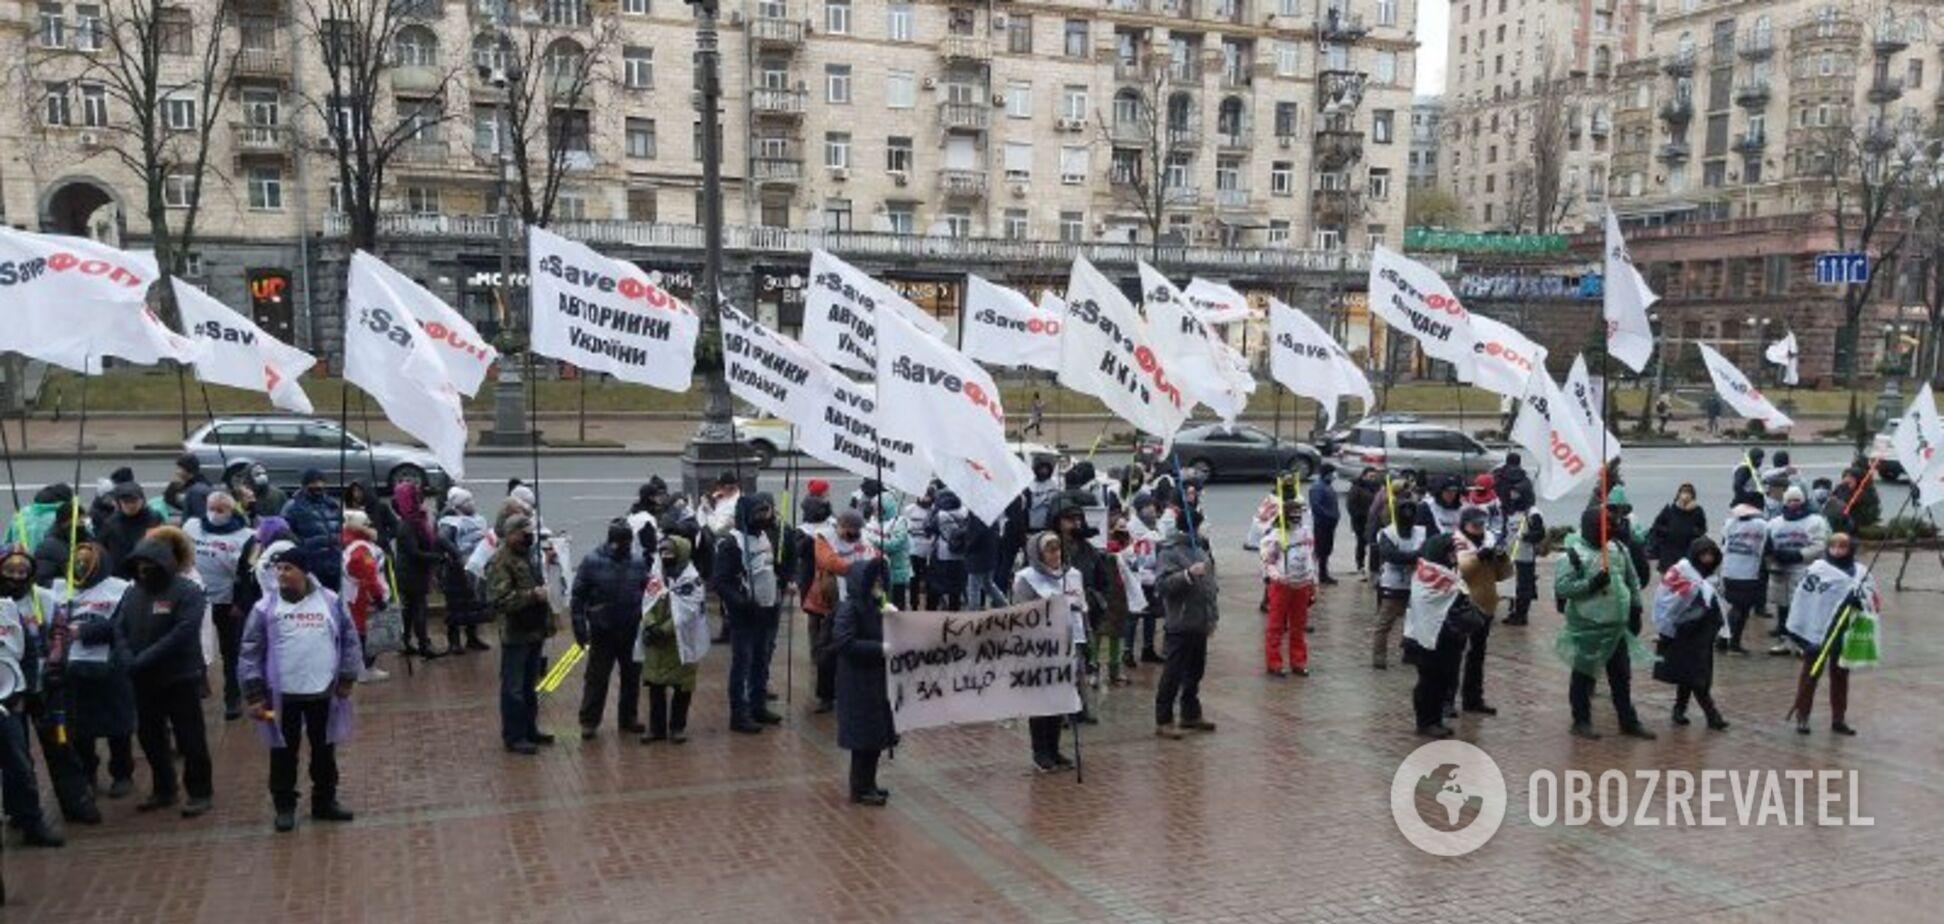 'Стоп локдаун!' У Києві ФОПи протестували проти карантину. Фото